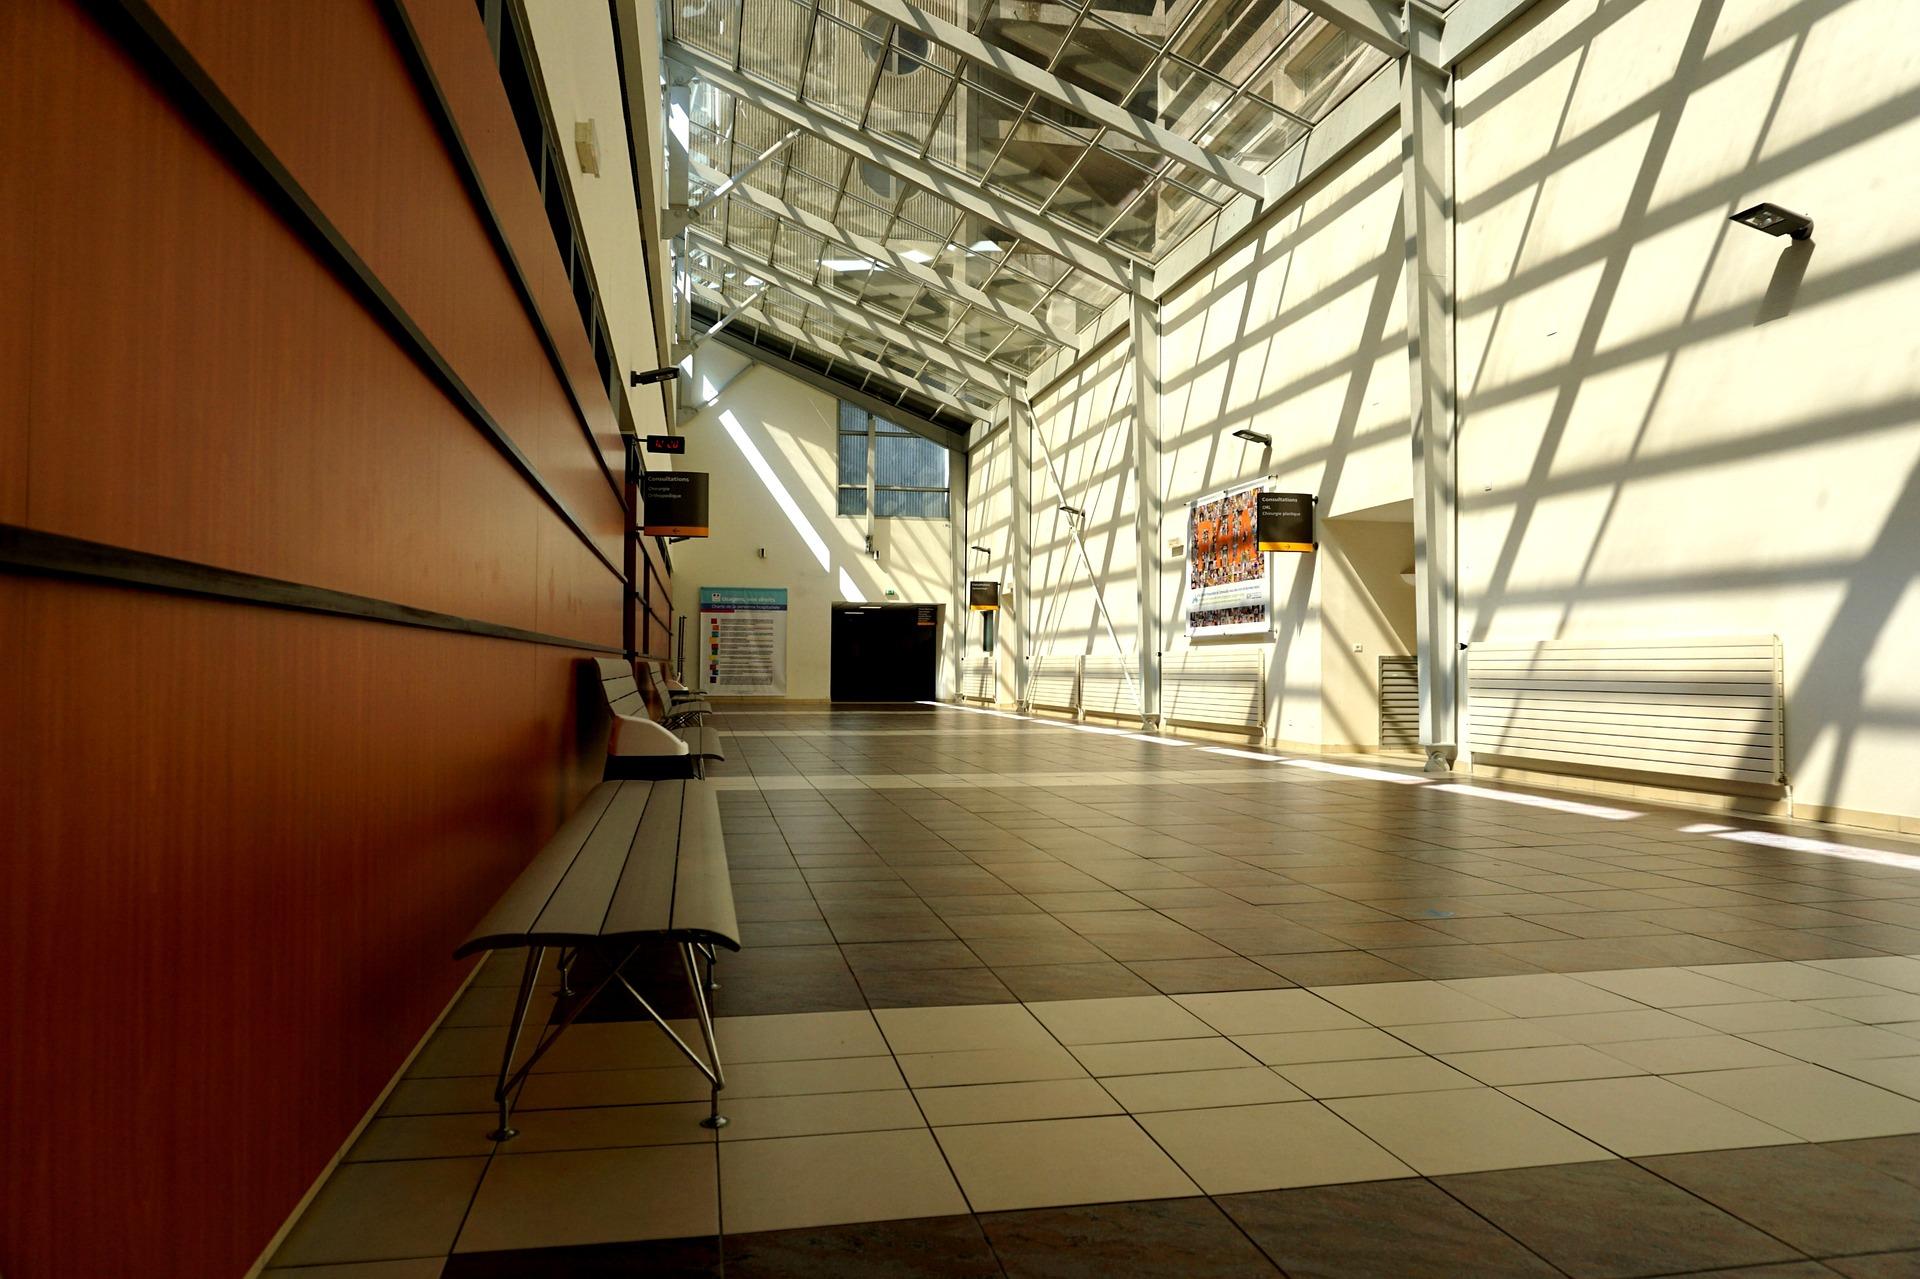 corridor-1729534_1920